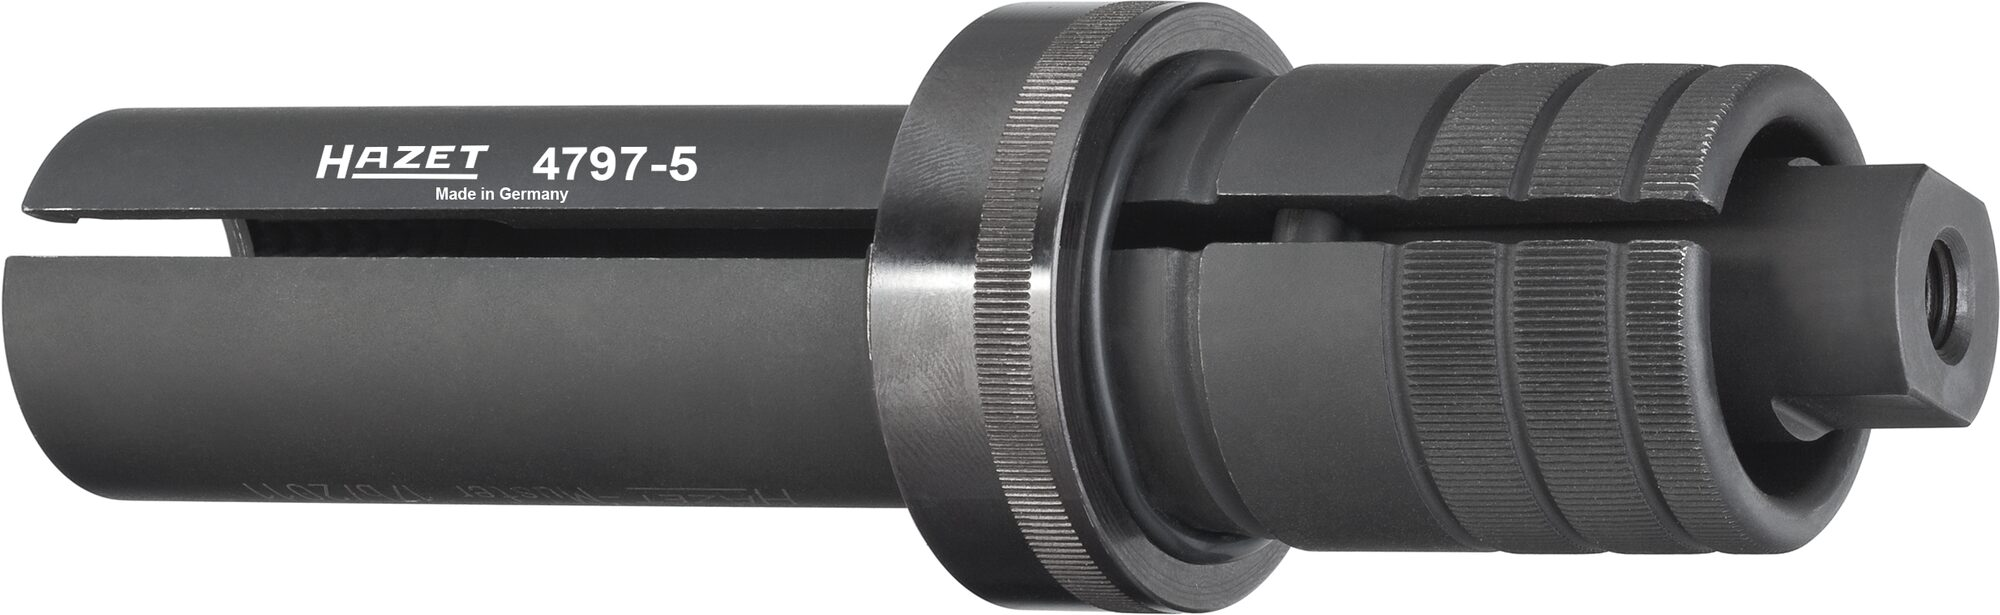 HAZET Injektor-Klaue 4797-5